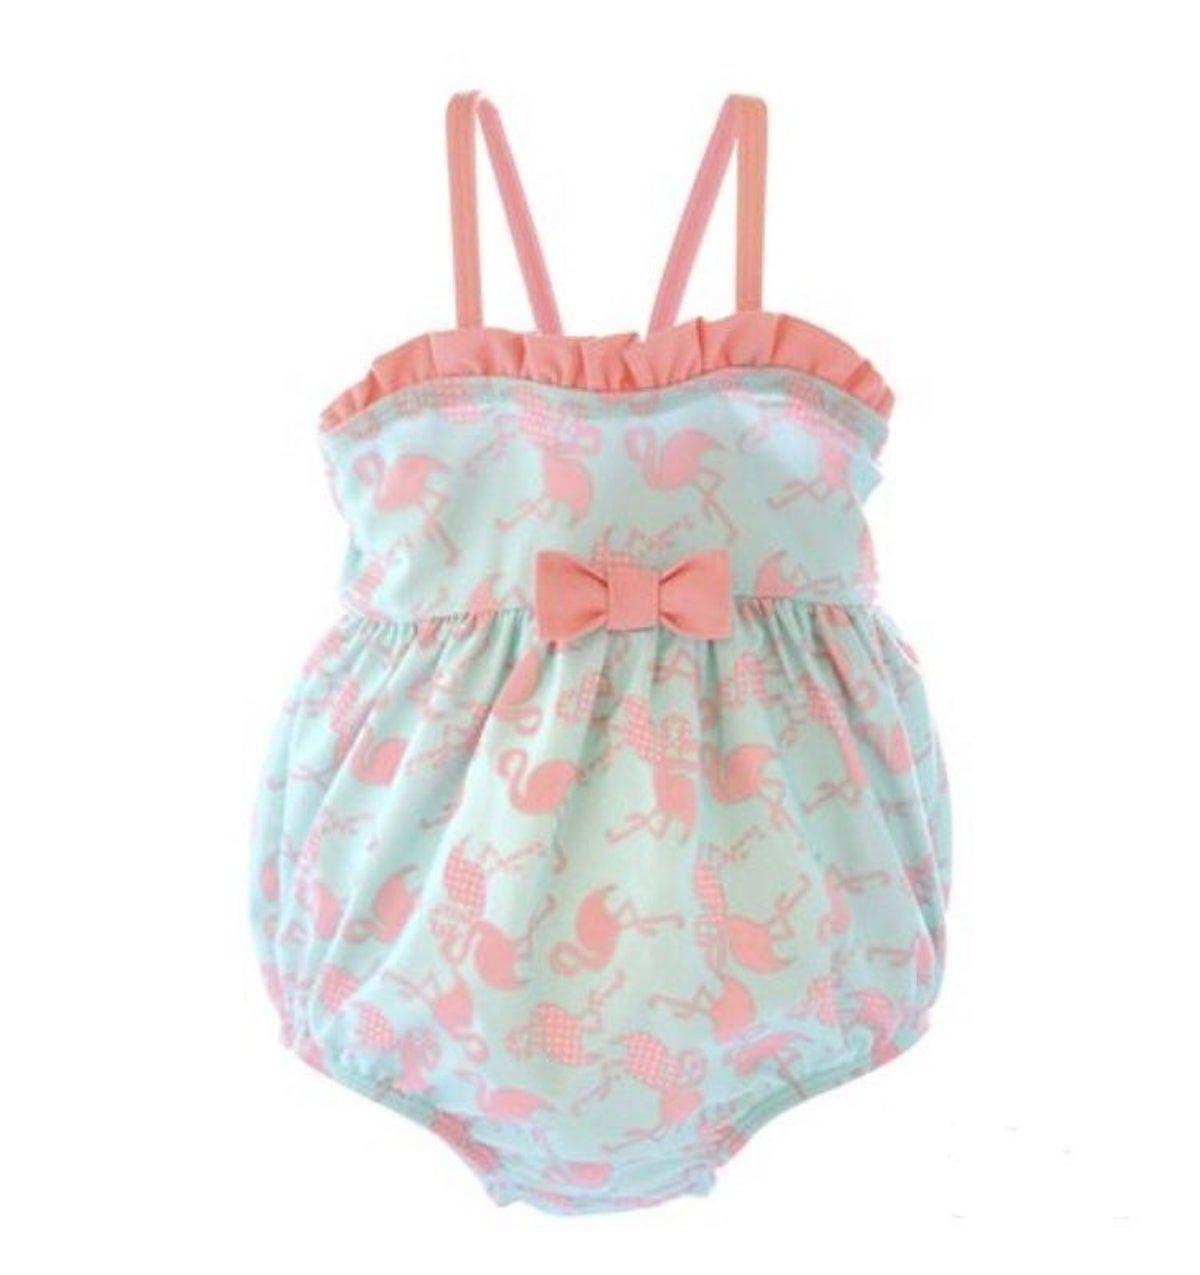 Infant Bathing Suit | Baby girl swimsuit, Newborn girl